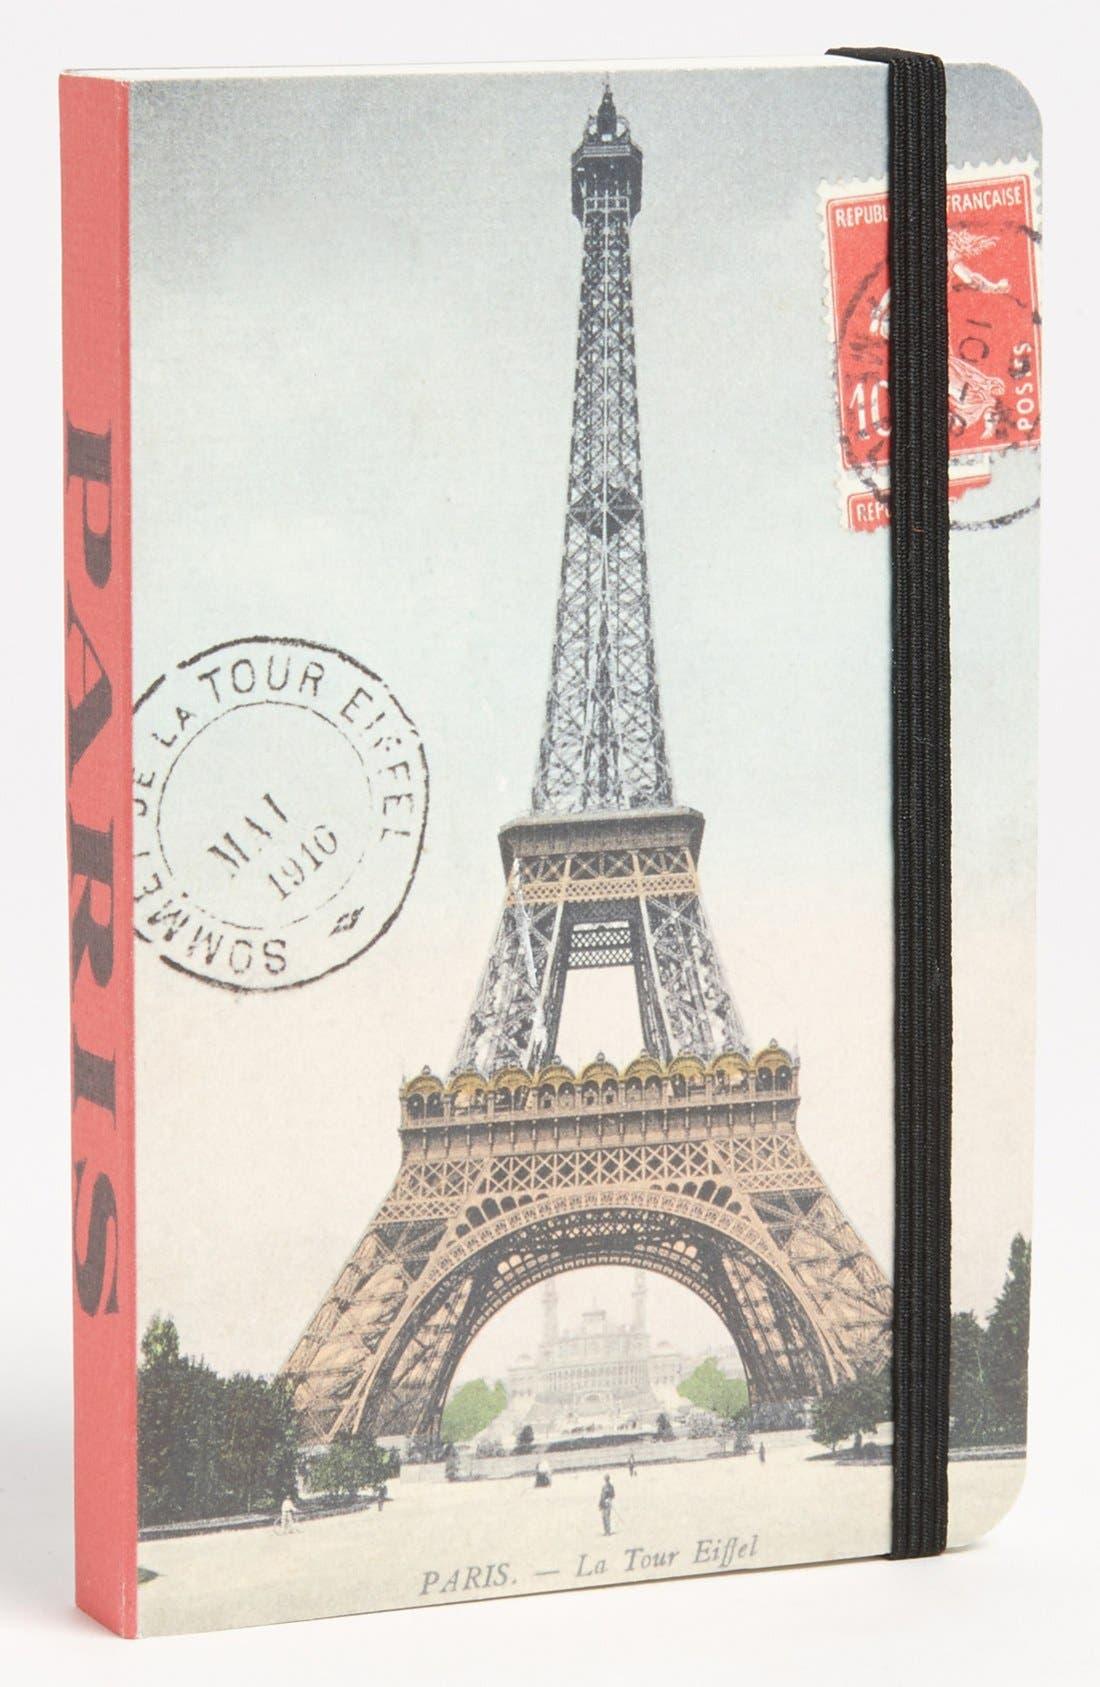 Alternate Image 1 Selected - Vintage Print Notebook